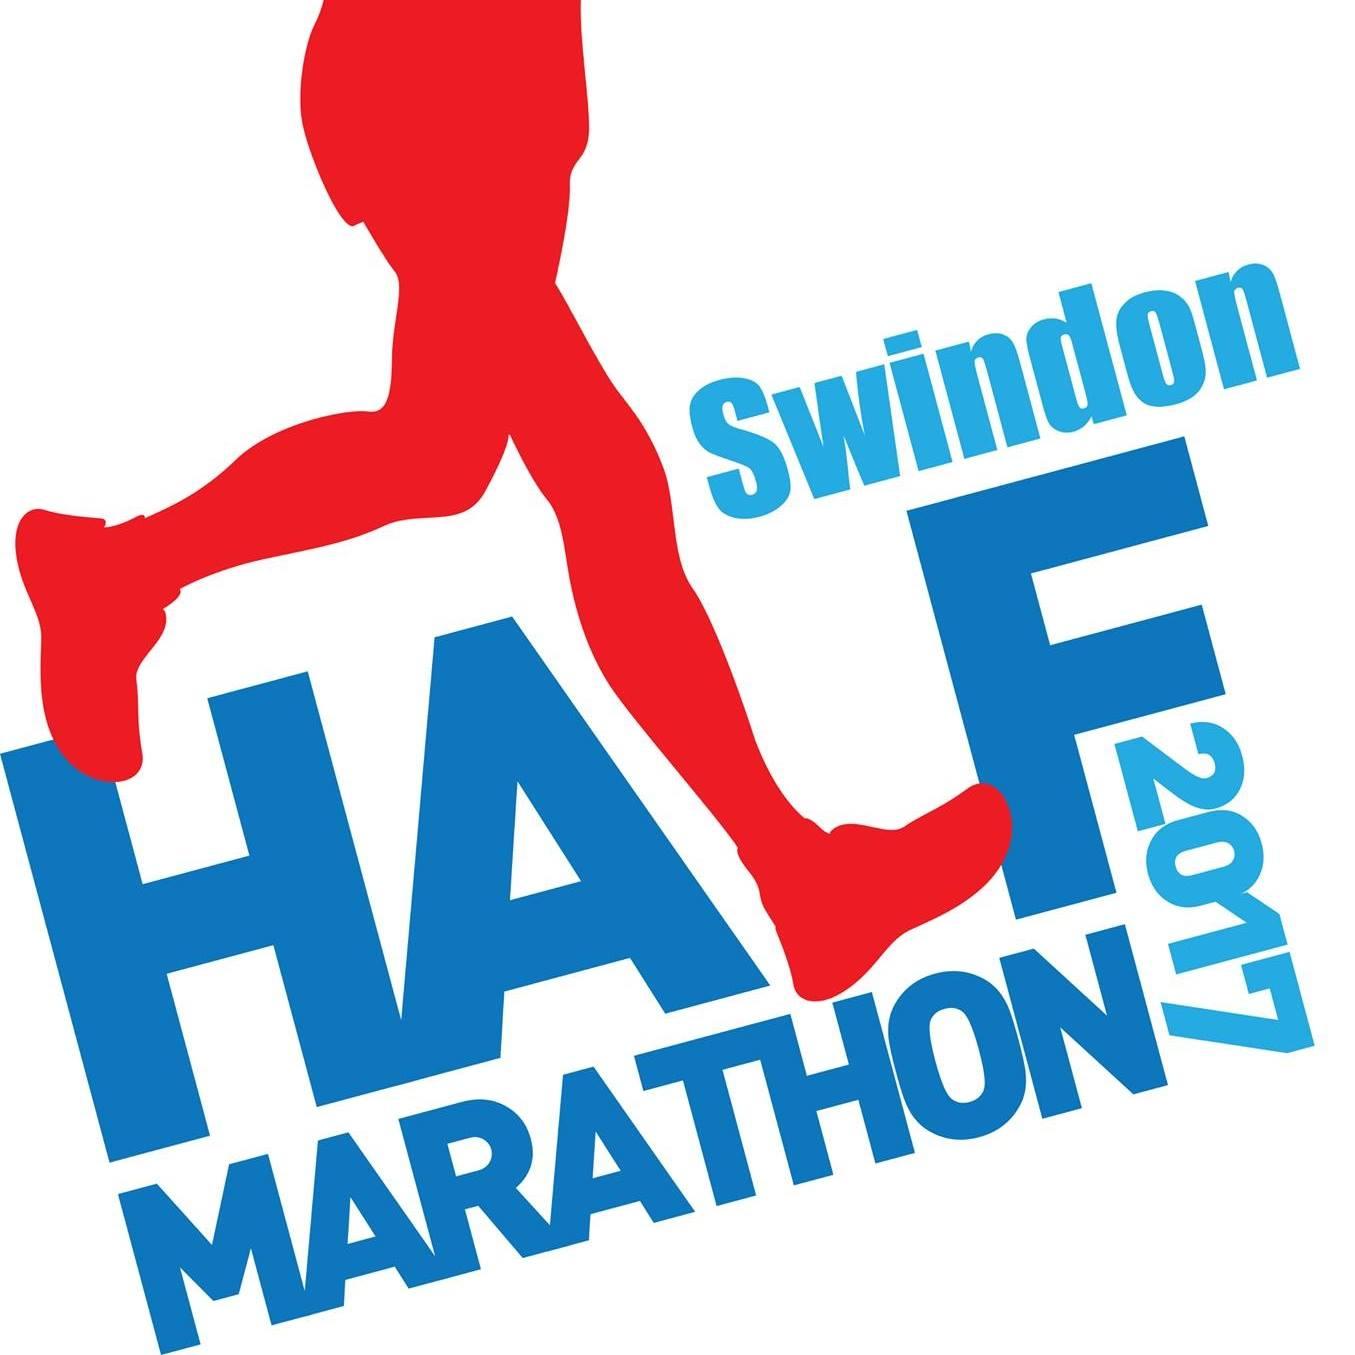 The Swindon Half Marathon logo